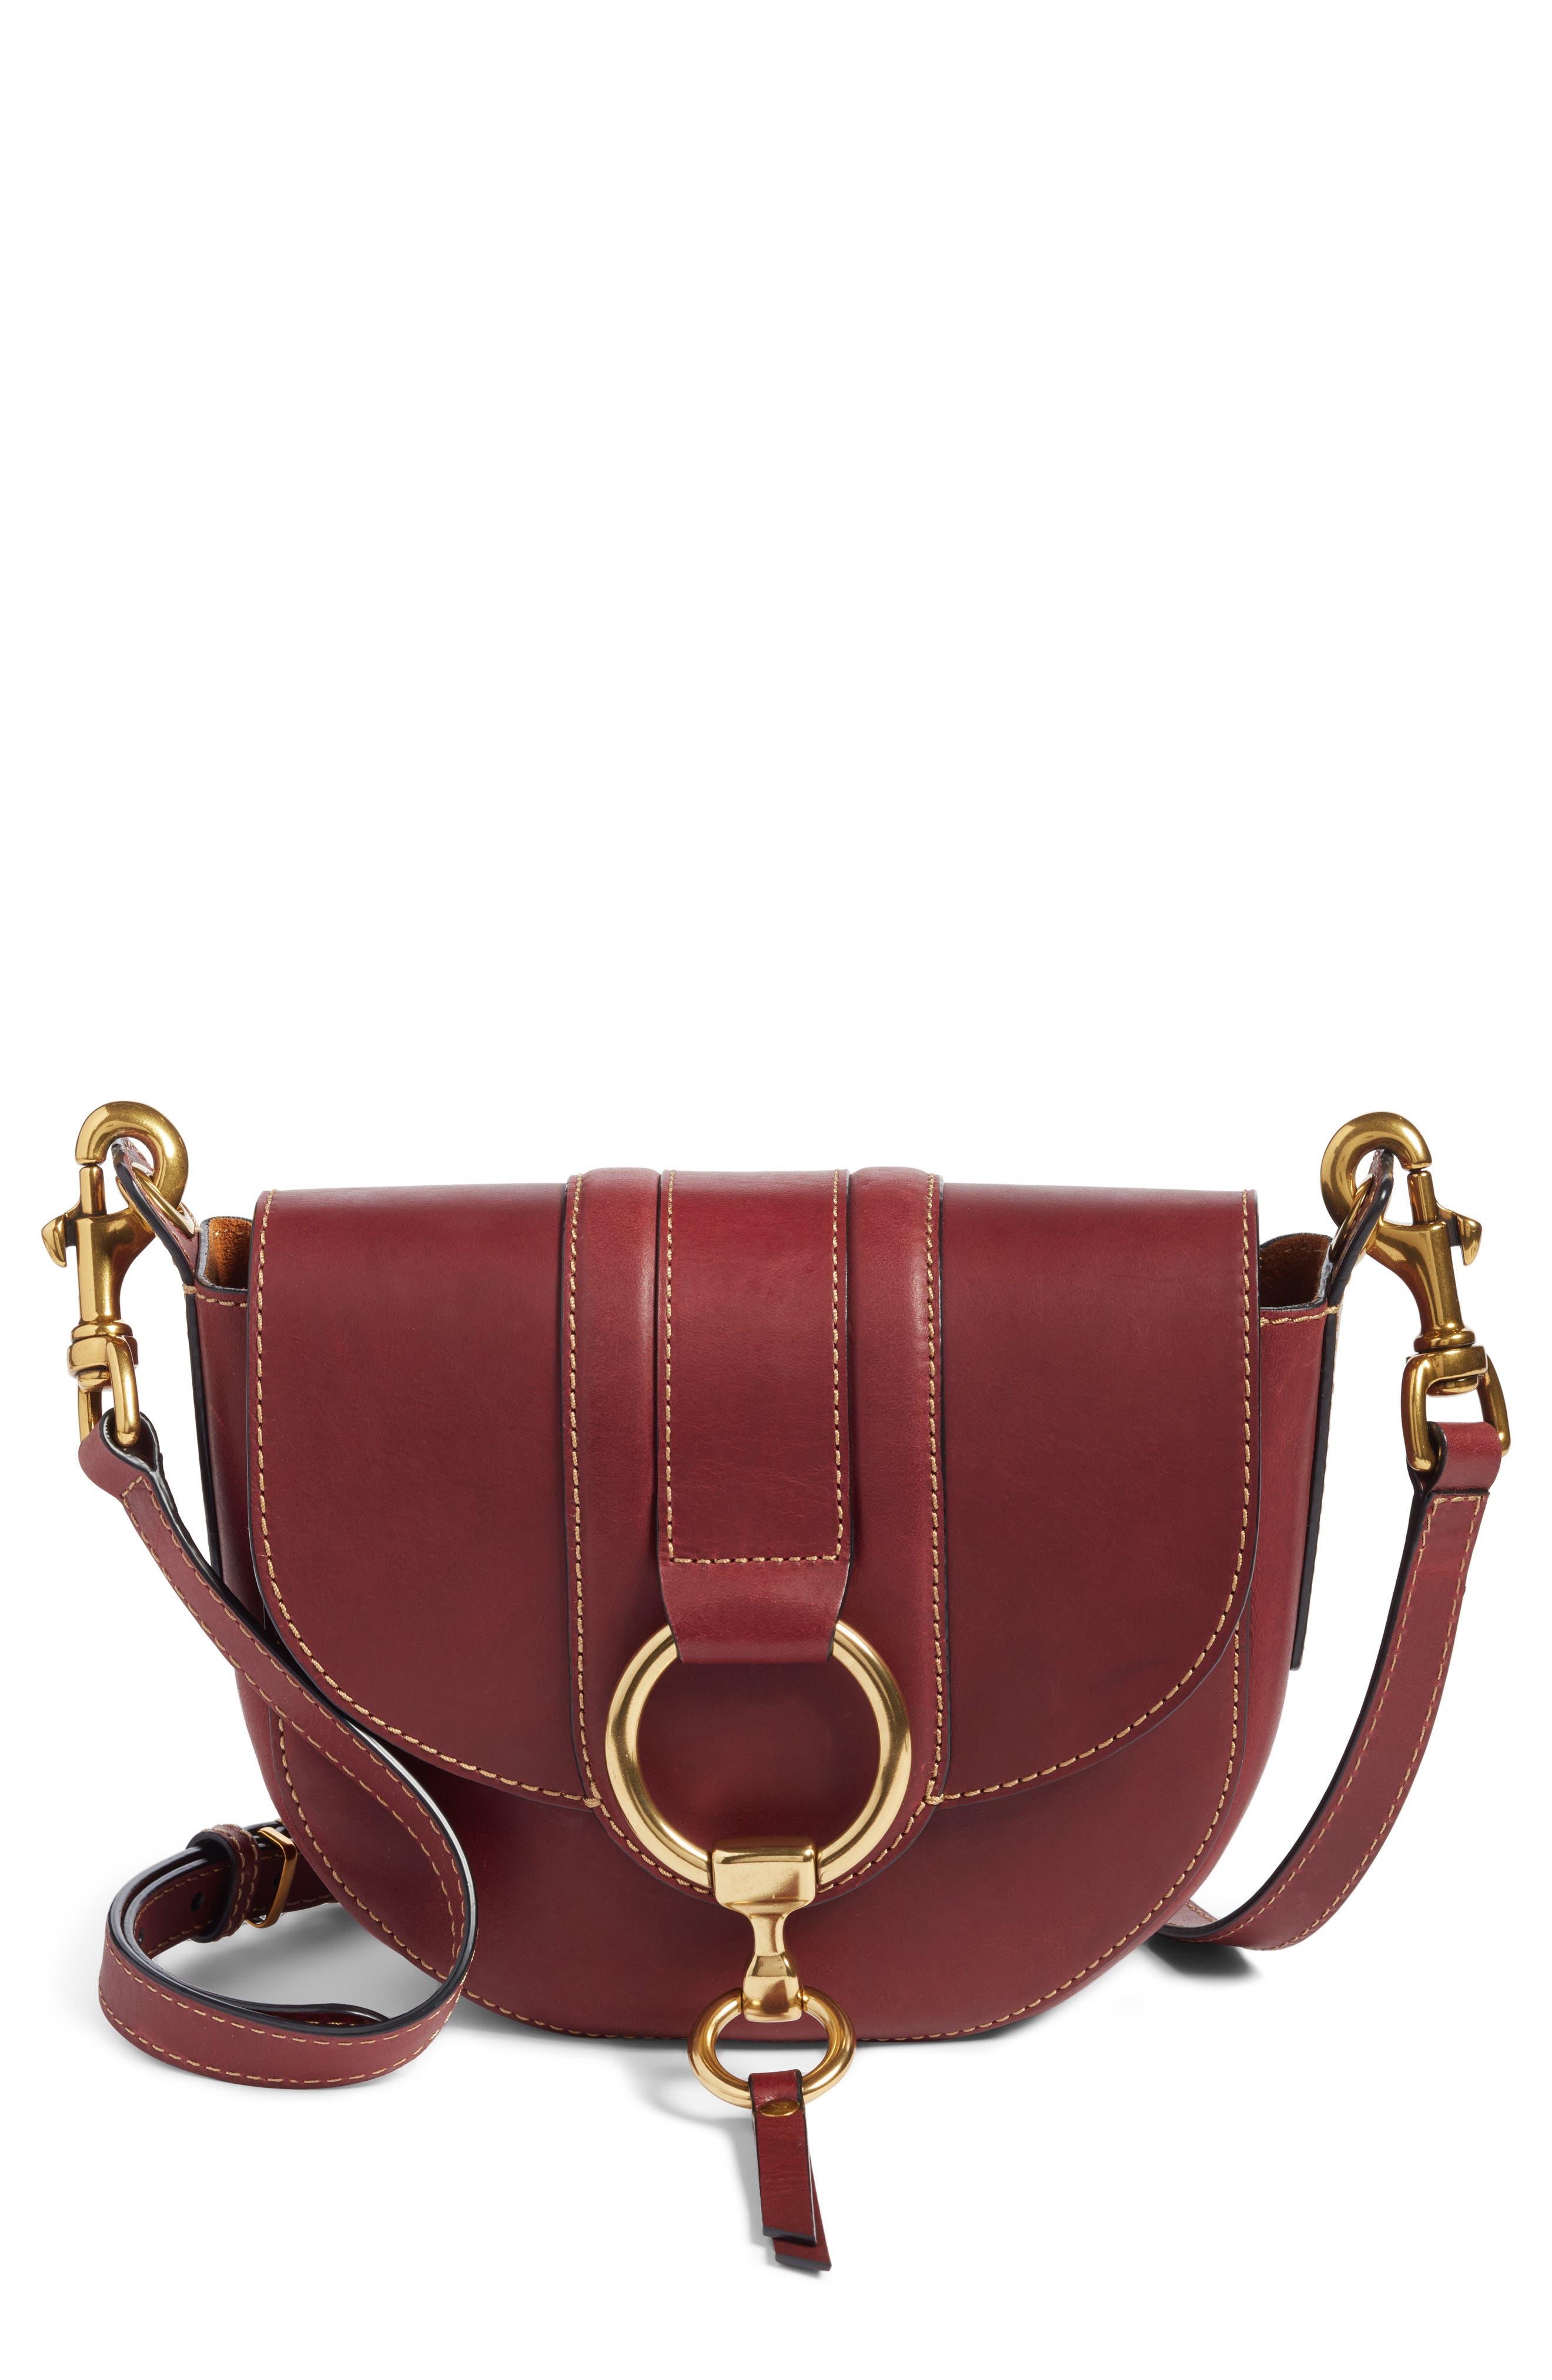 Alternate Image 1 Selected - Frye Small Ilana Harness Leather Saddle Bag